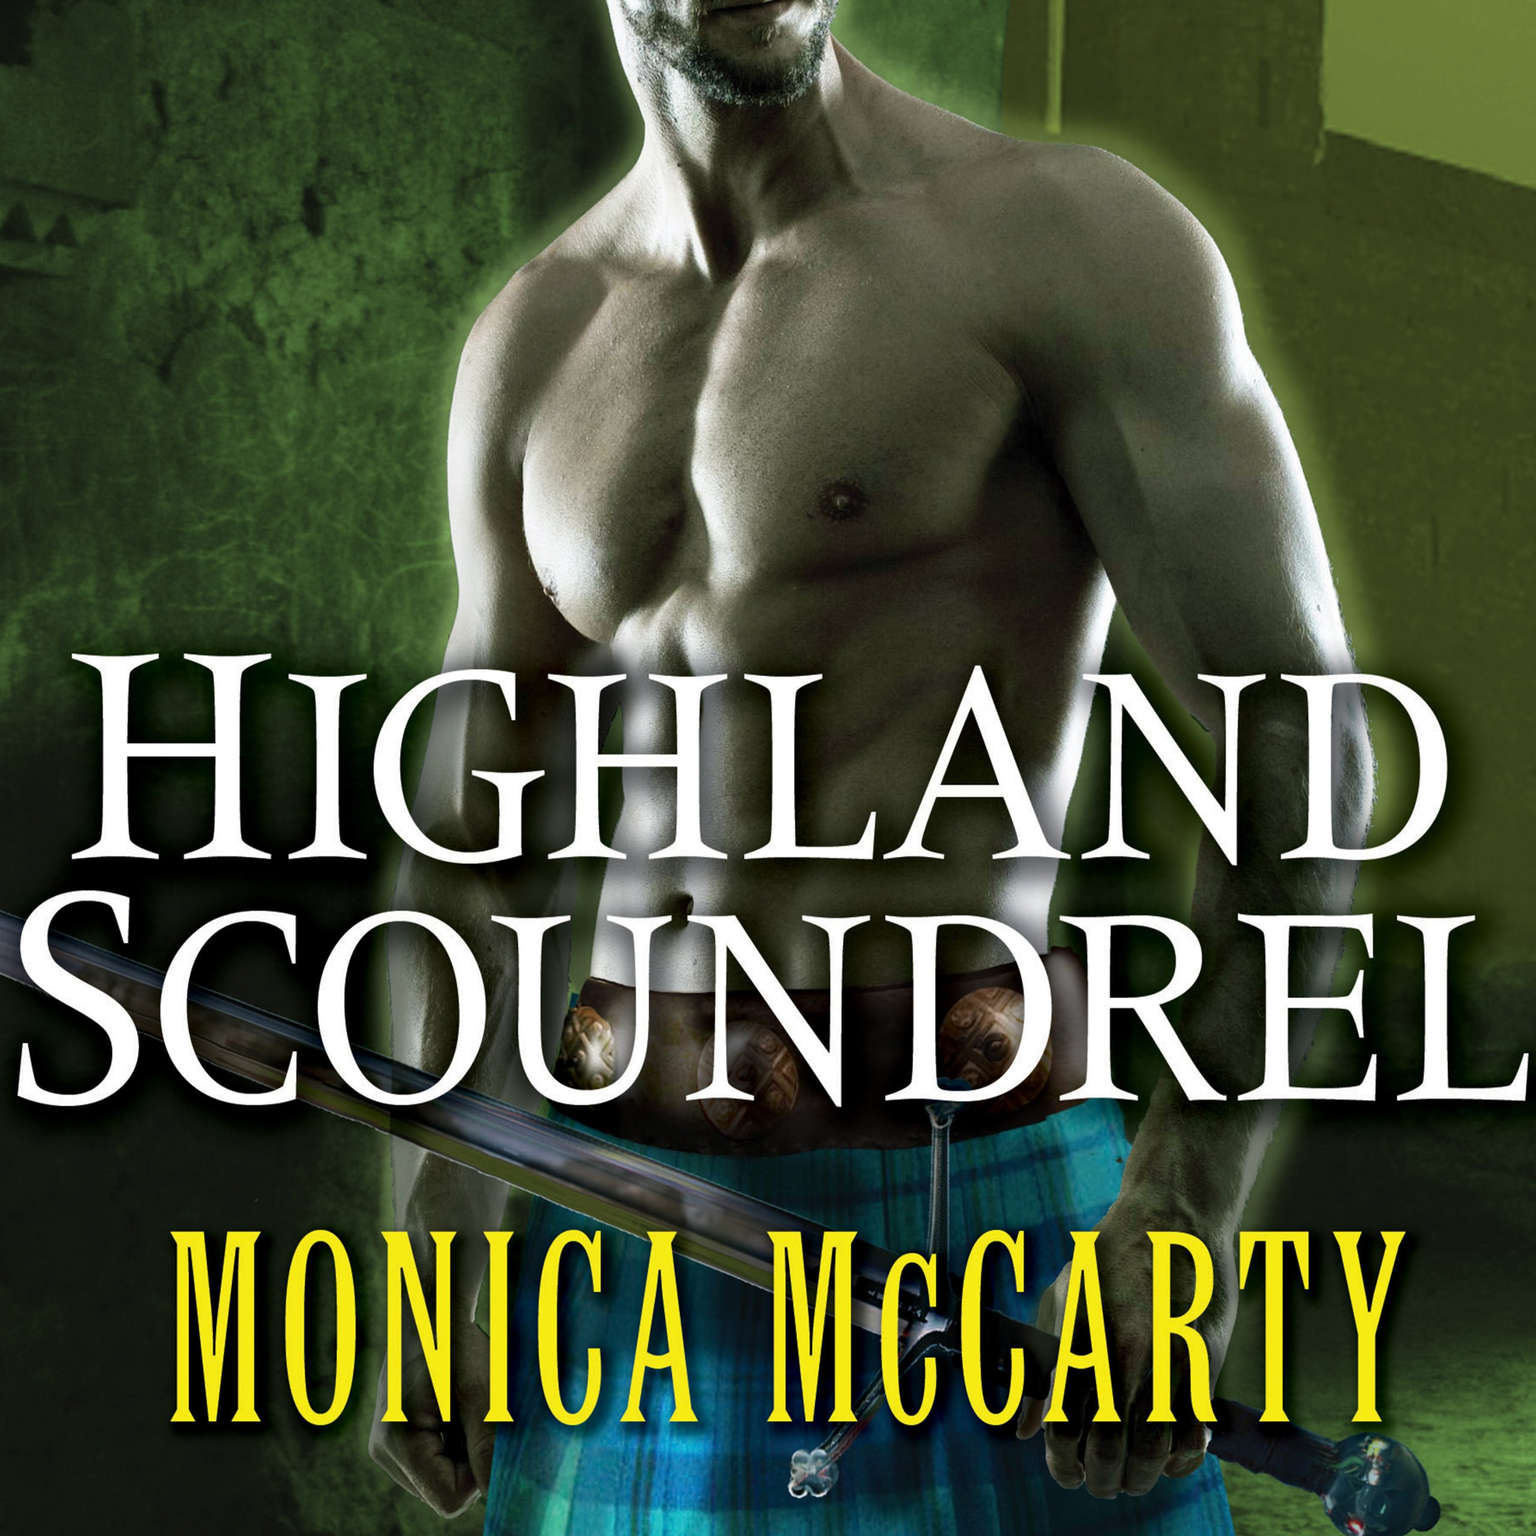 Highland Scoundrel: A Novel Audiobook, by Monica McCarty